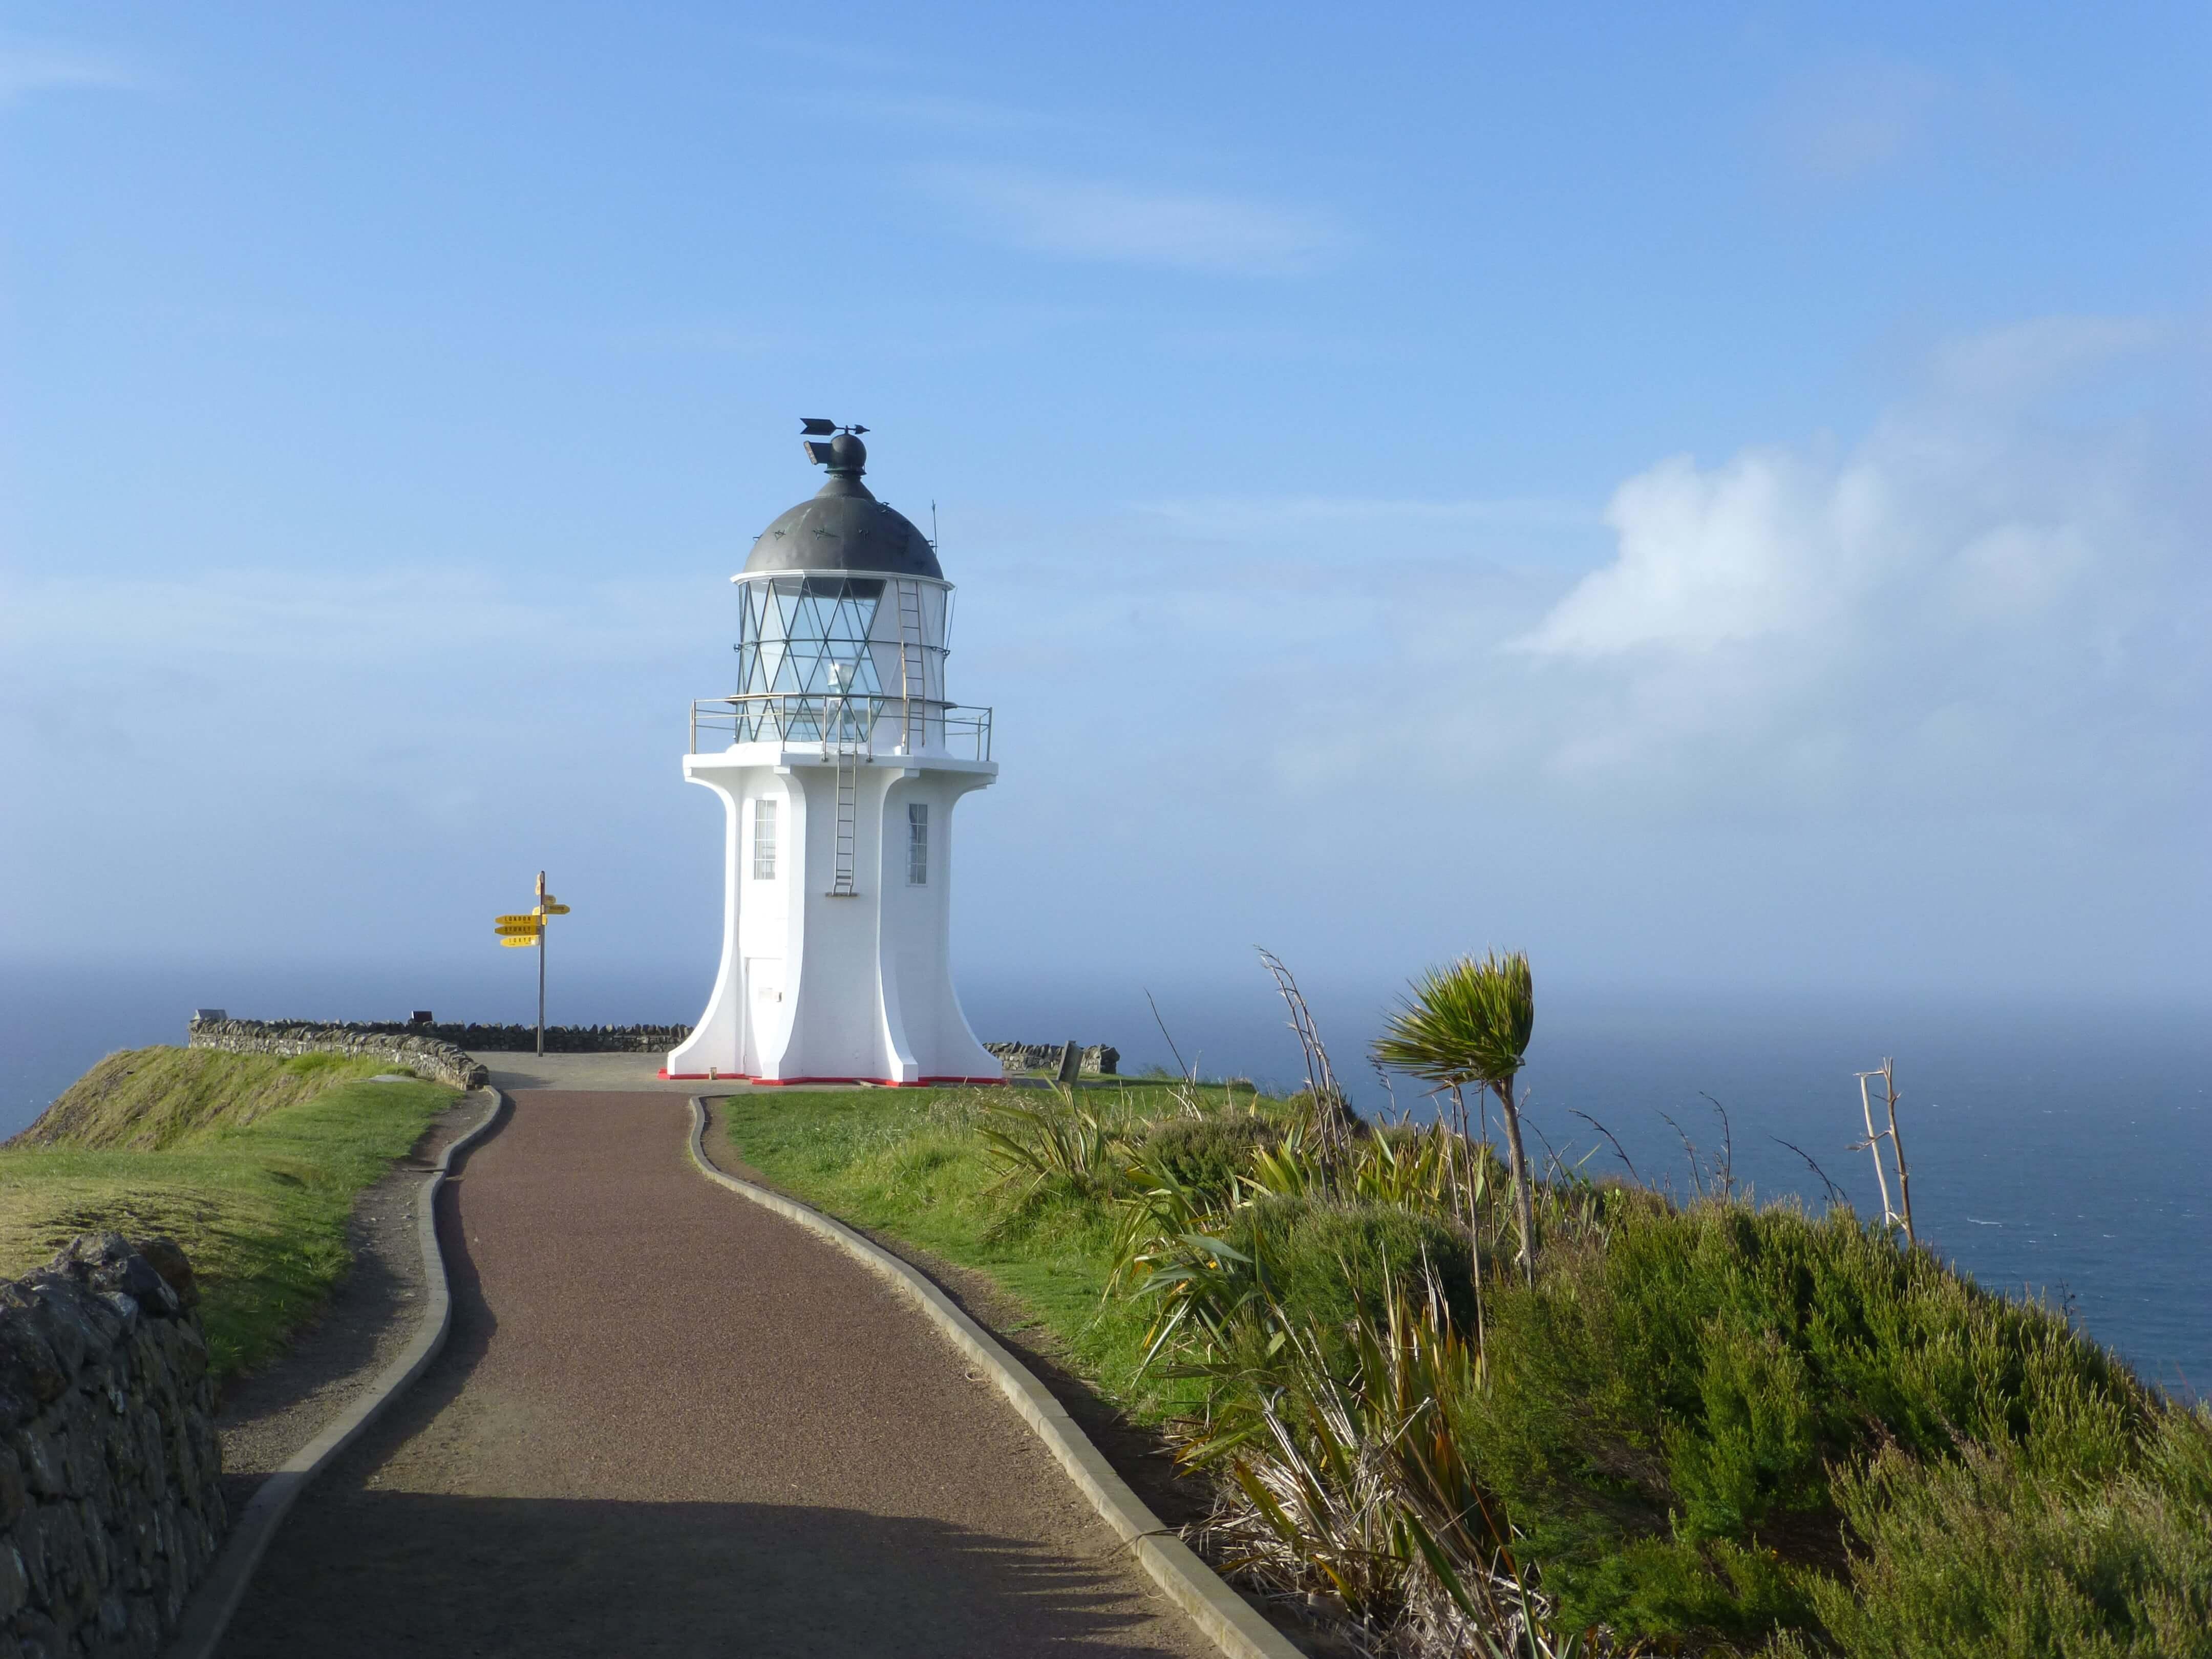 Neuseelandreise Weit-weg reisen Cape Reinga